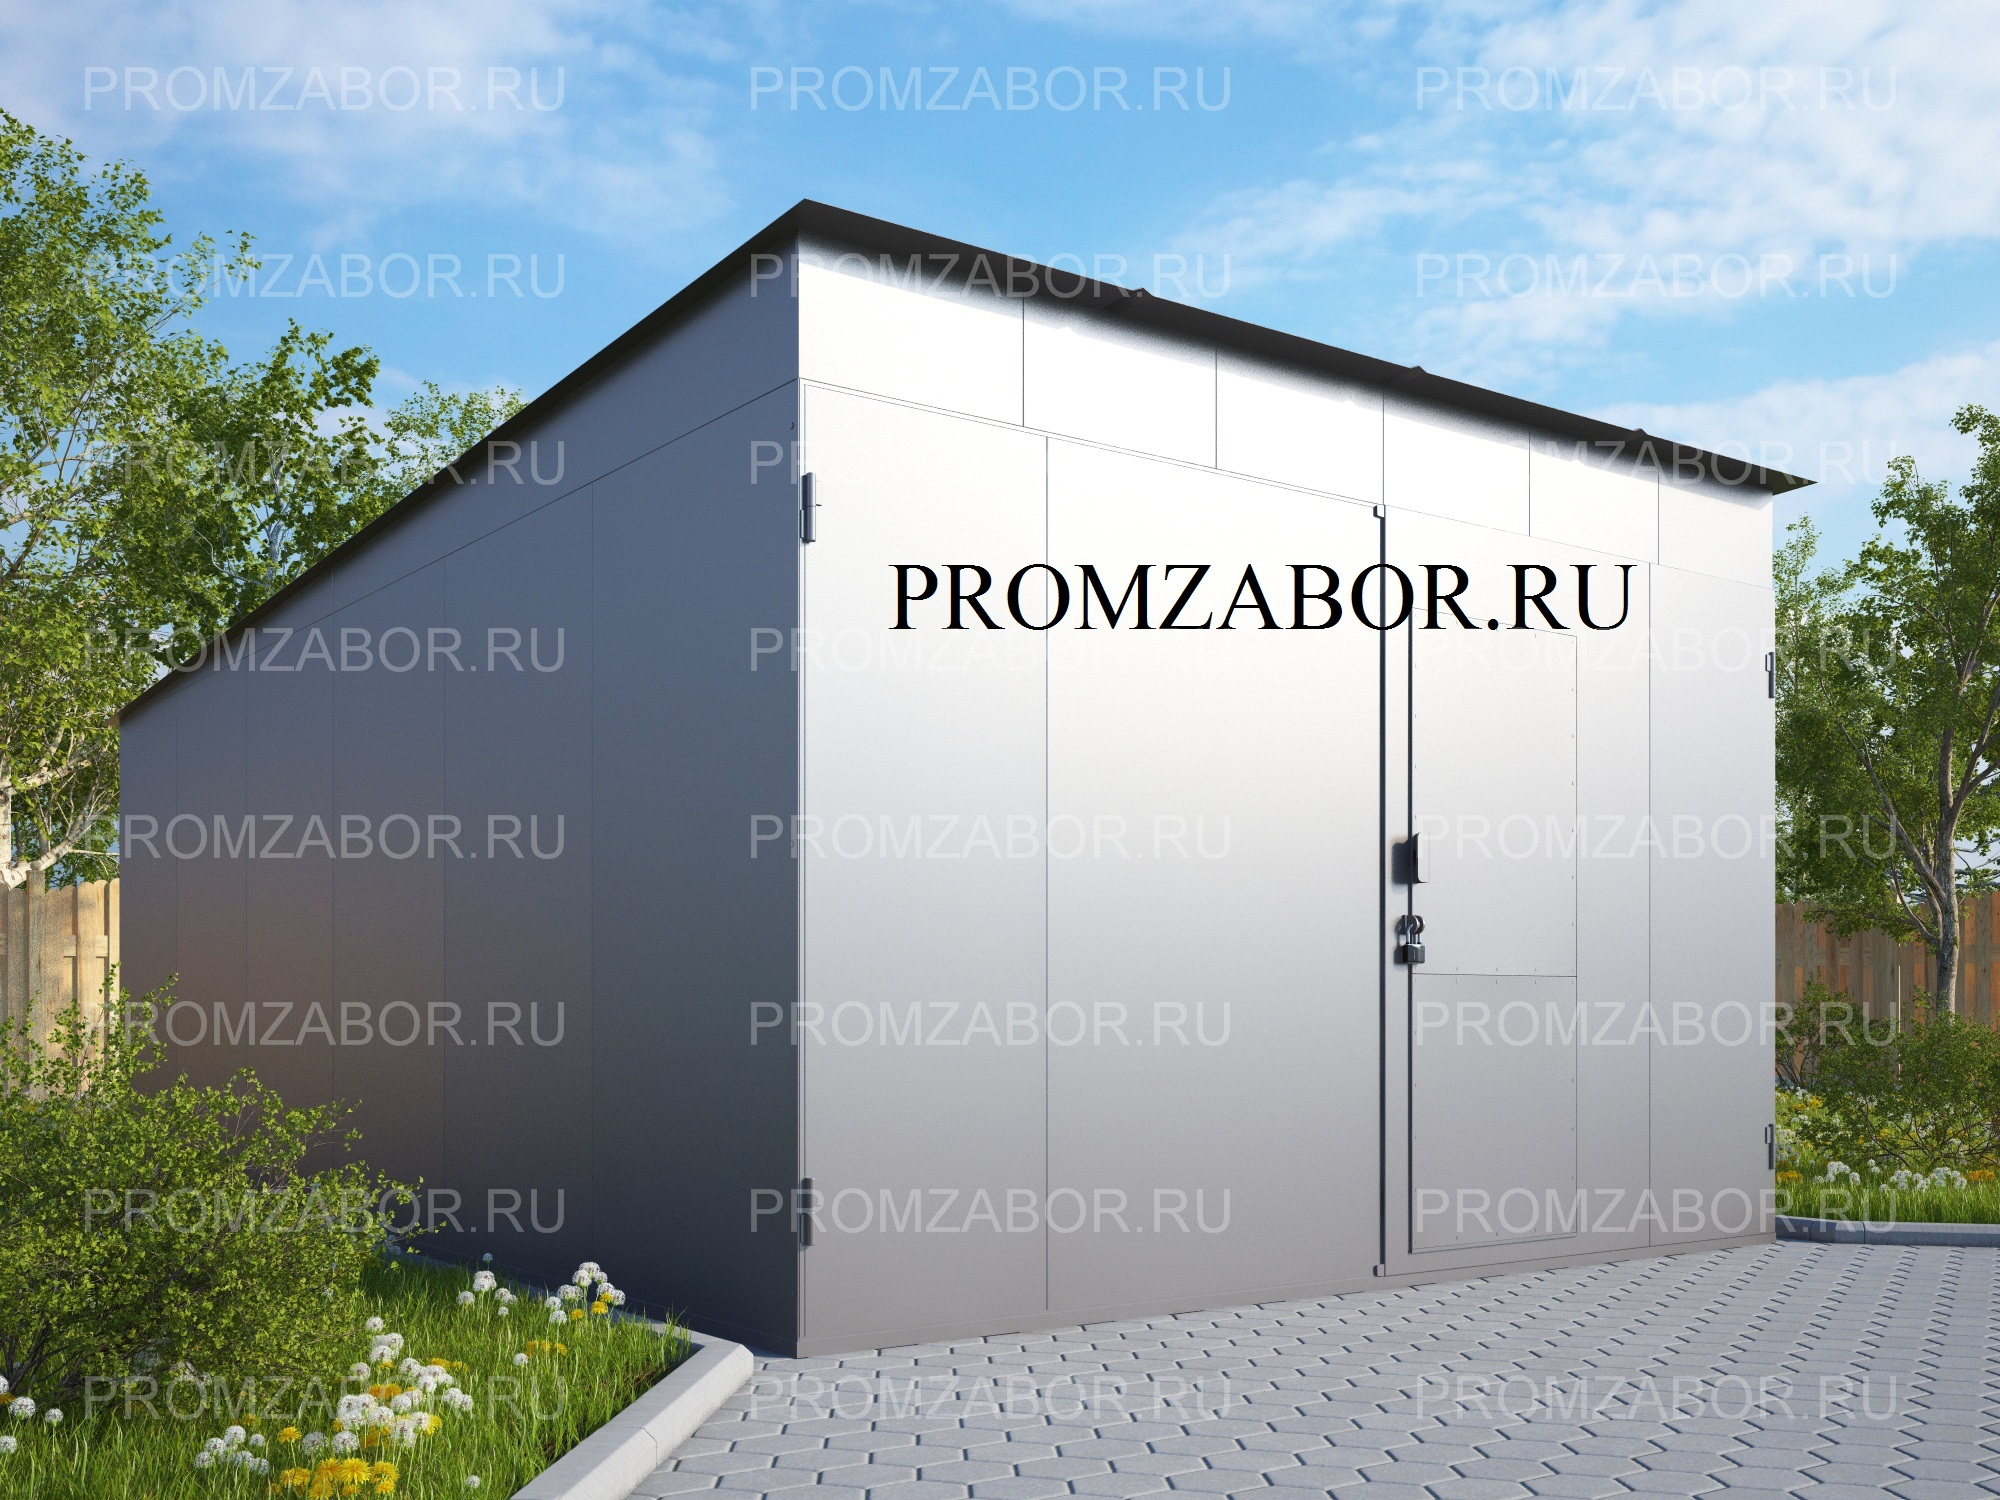 Онлайн калькулятор строительства гаража